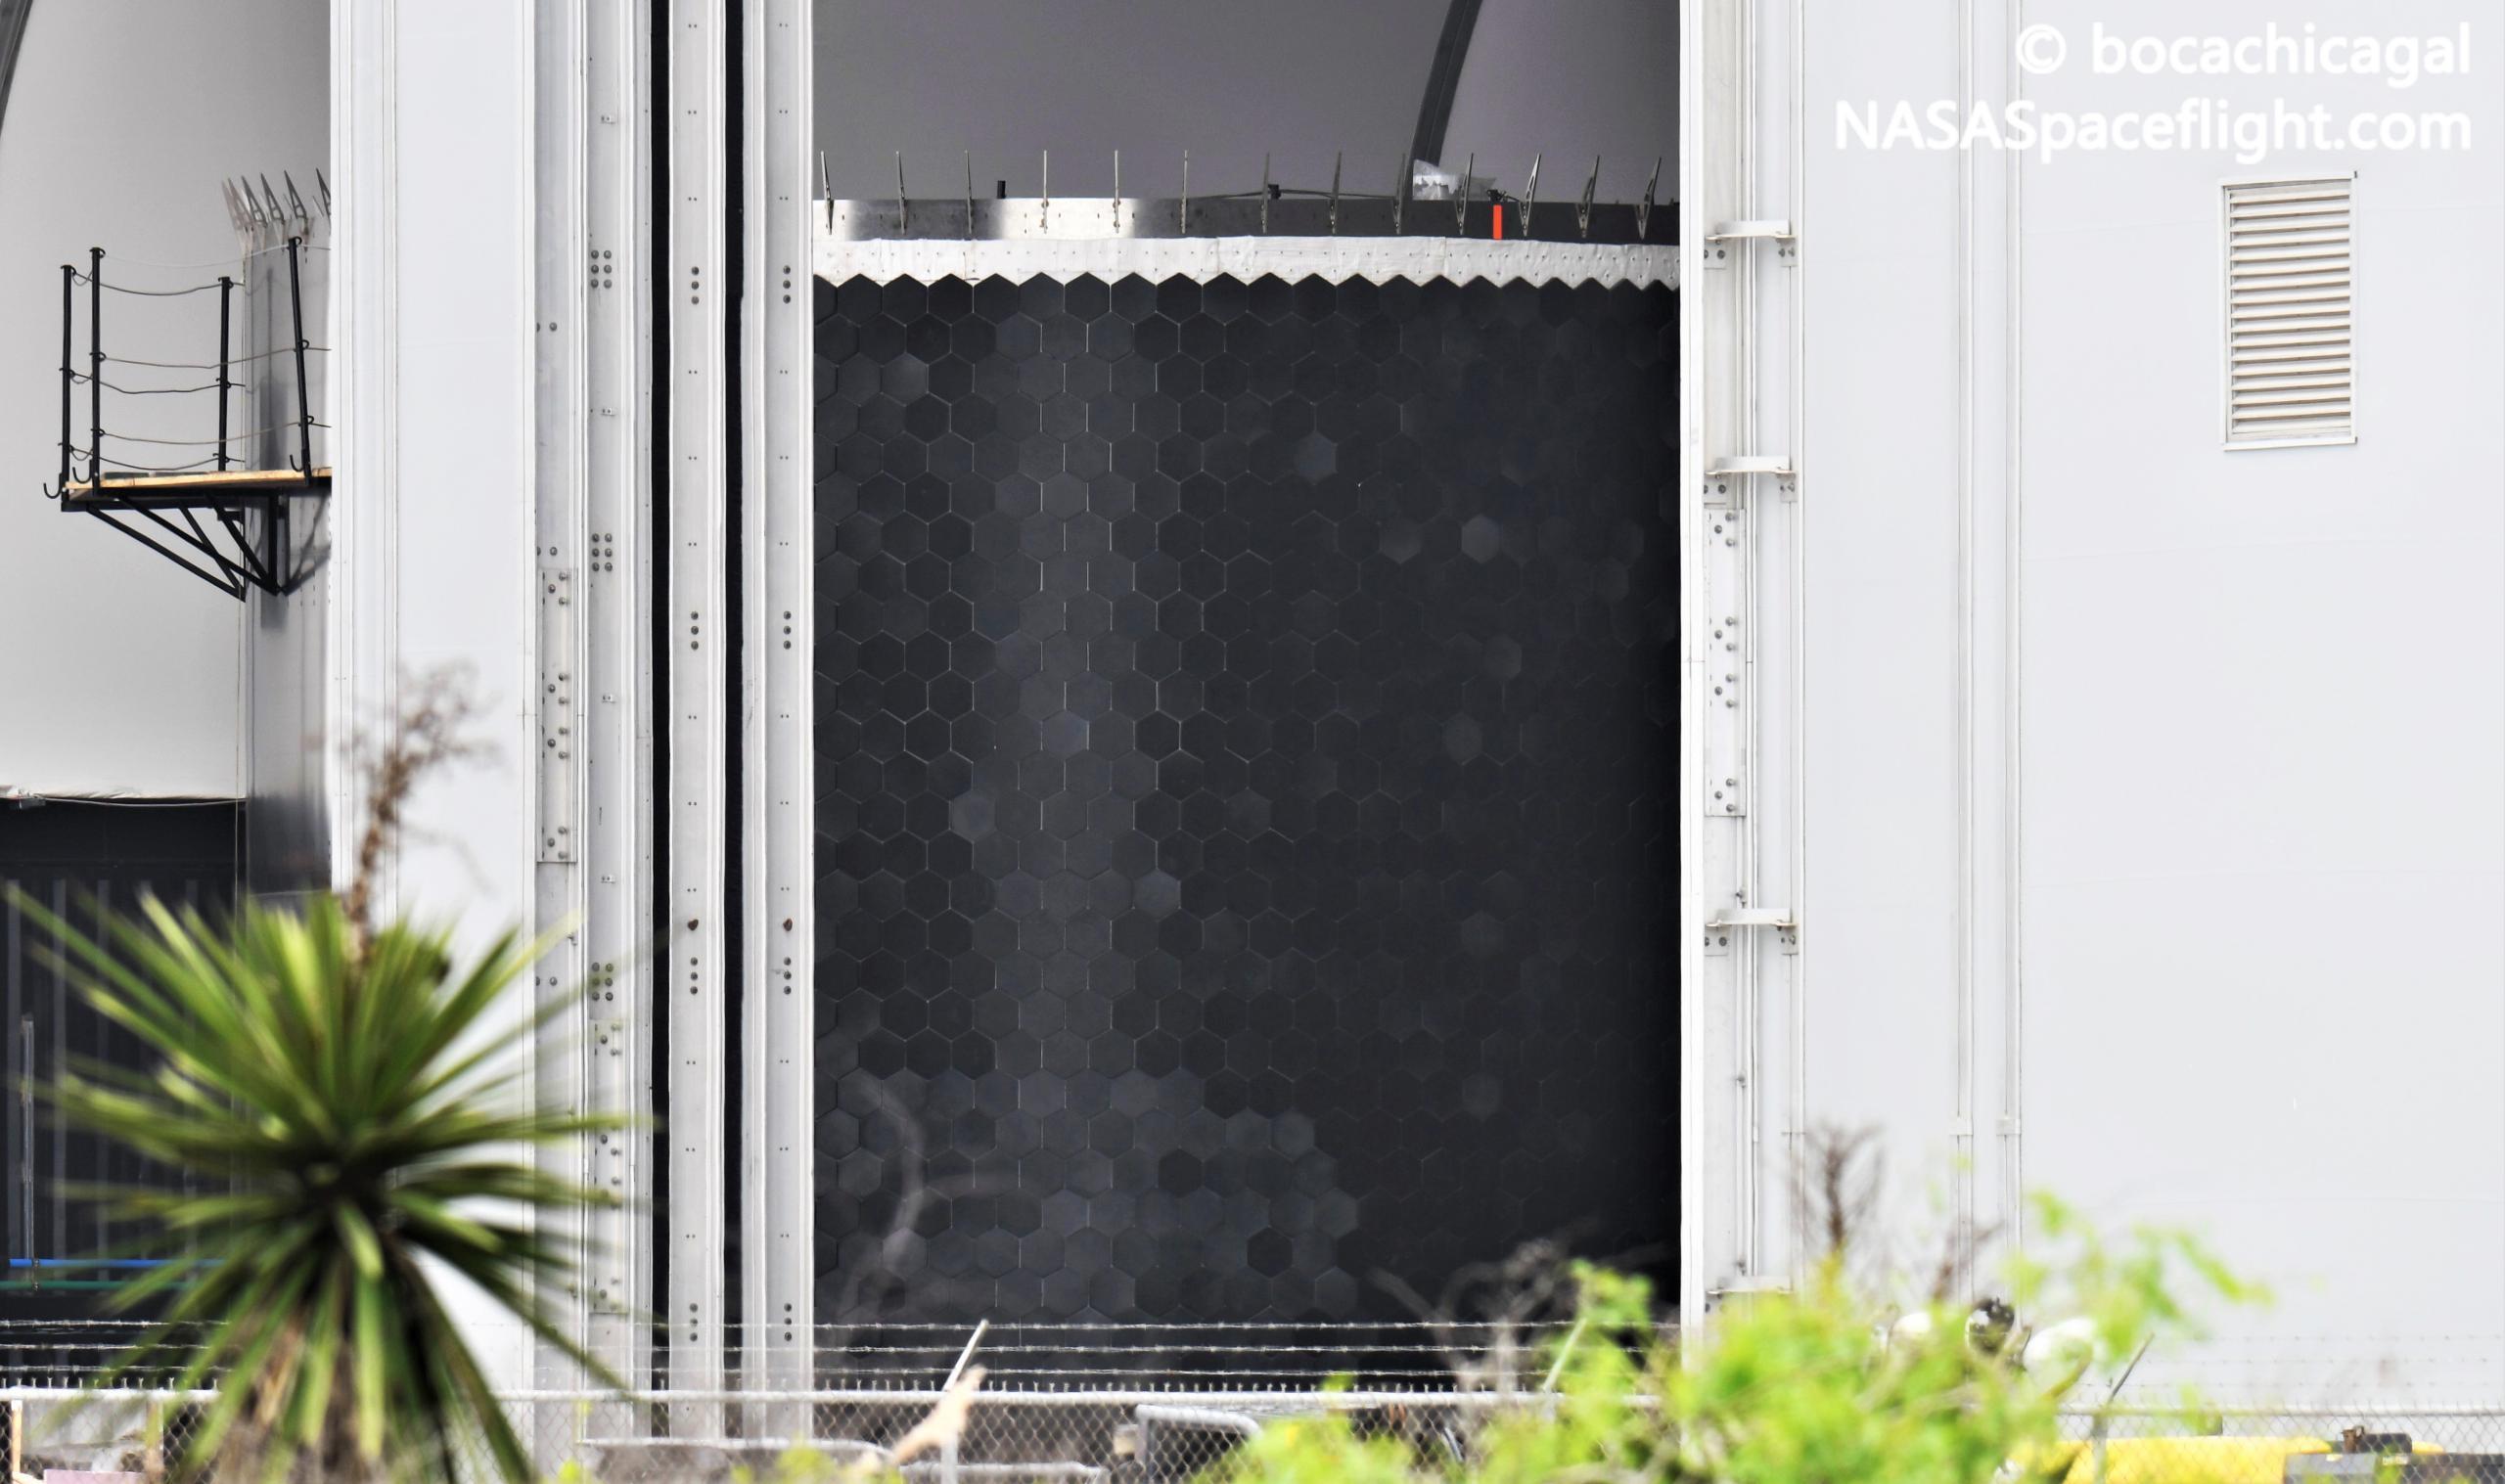 Starship Boca Chica 042321 (NASASpaceflight – bocachicagal) SN17 ring + heat shield 1 crop (c)